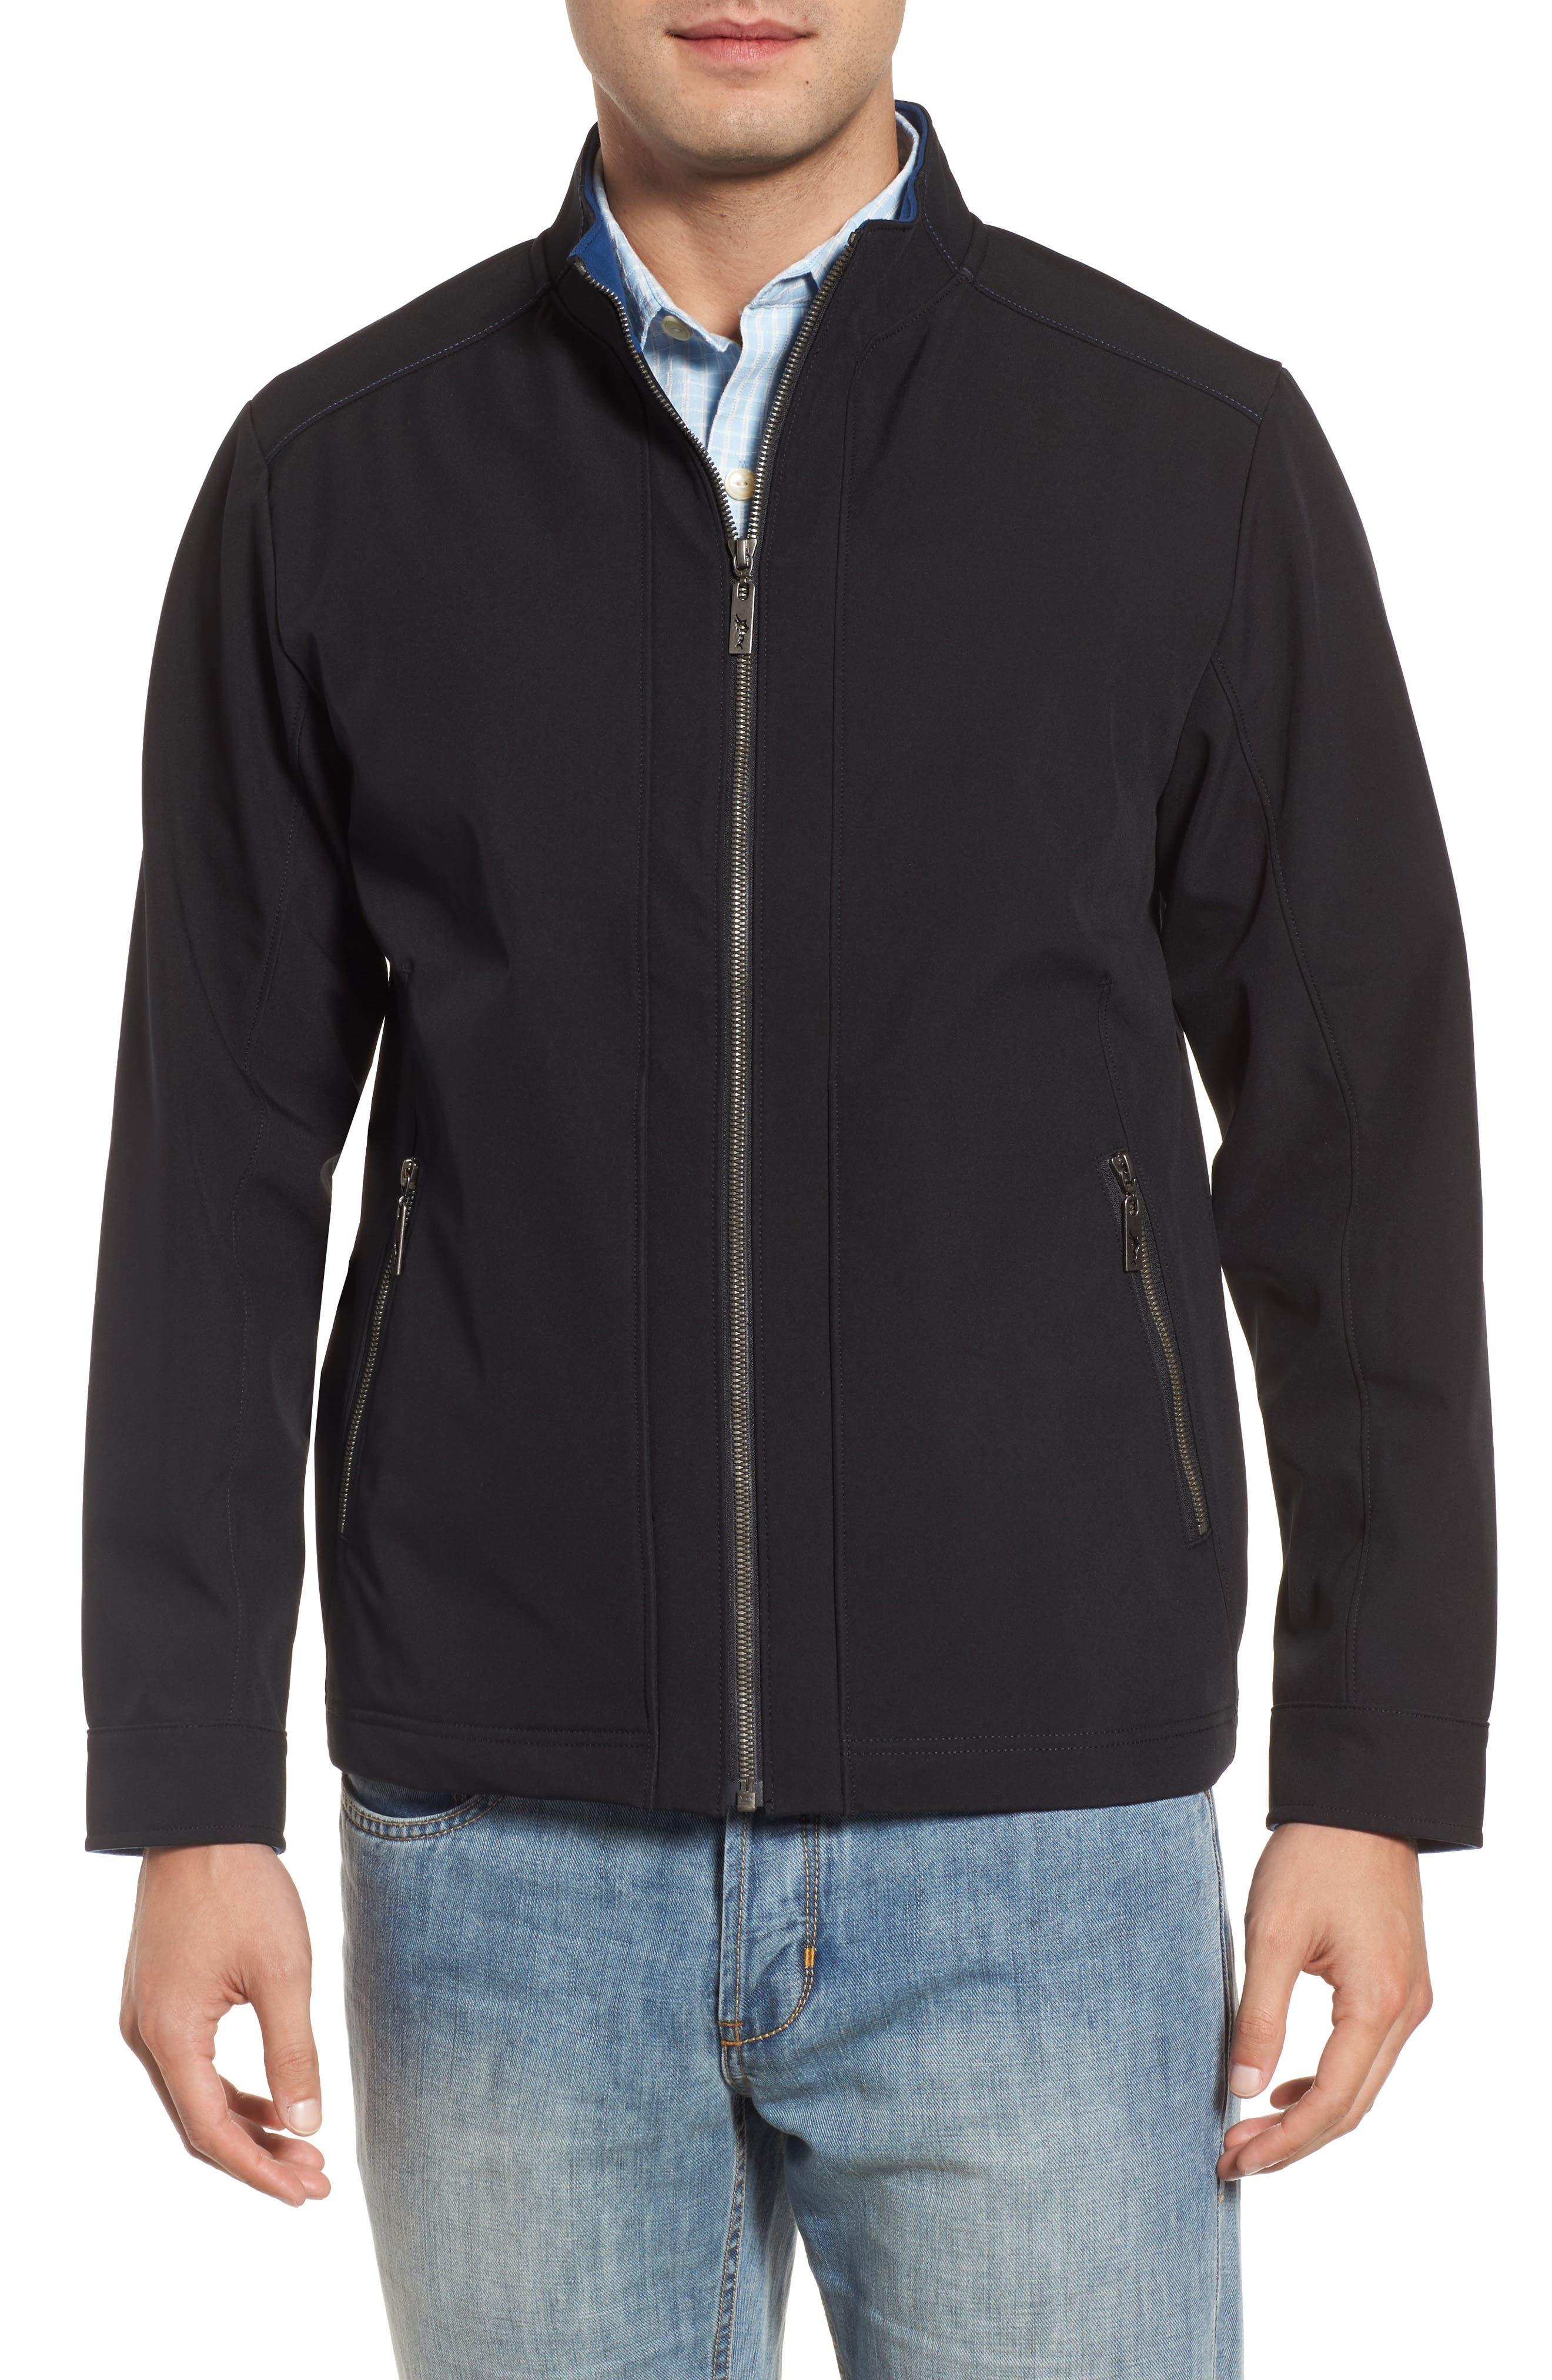 Downswing Zip Jacket,                             Alternate thumbnail 4, color,                             Black